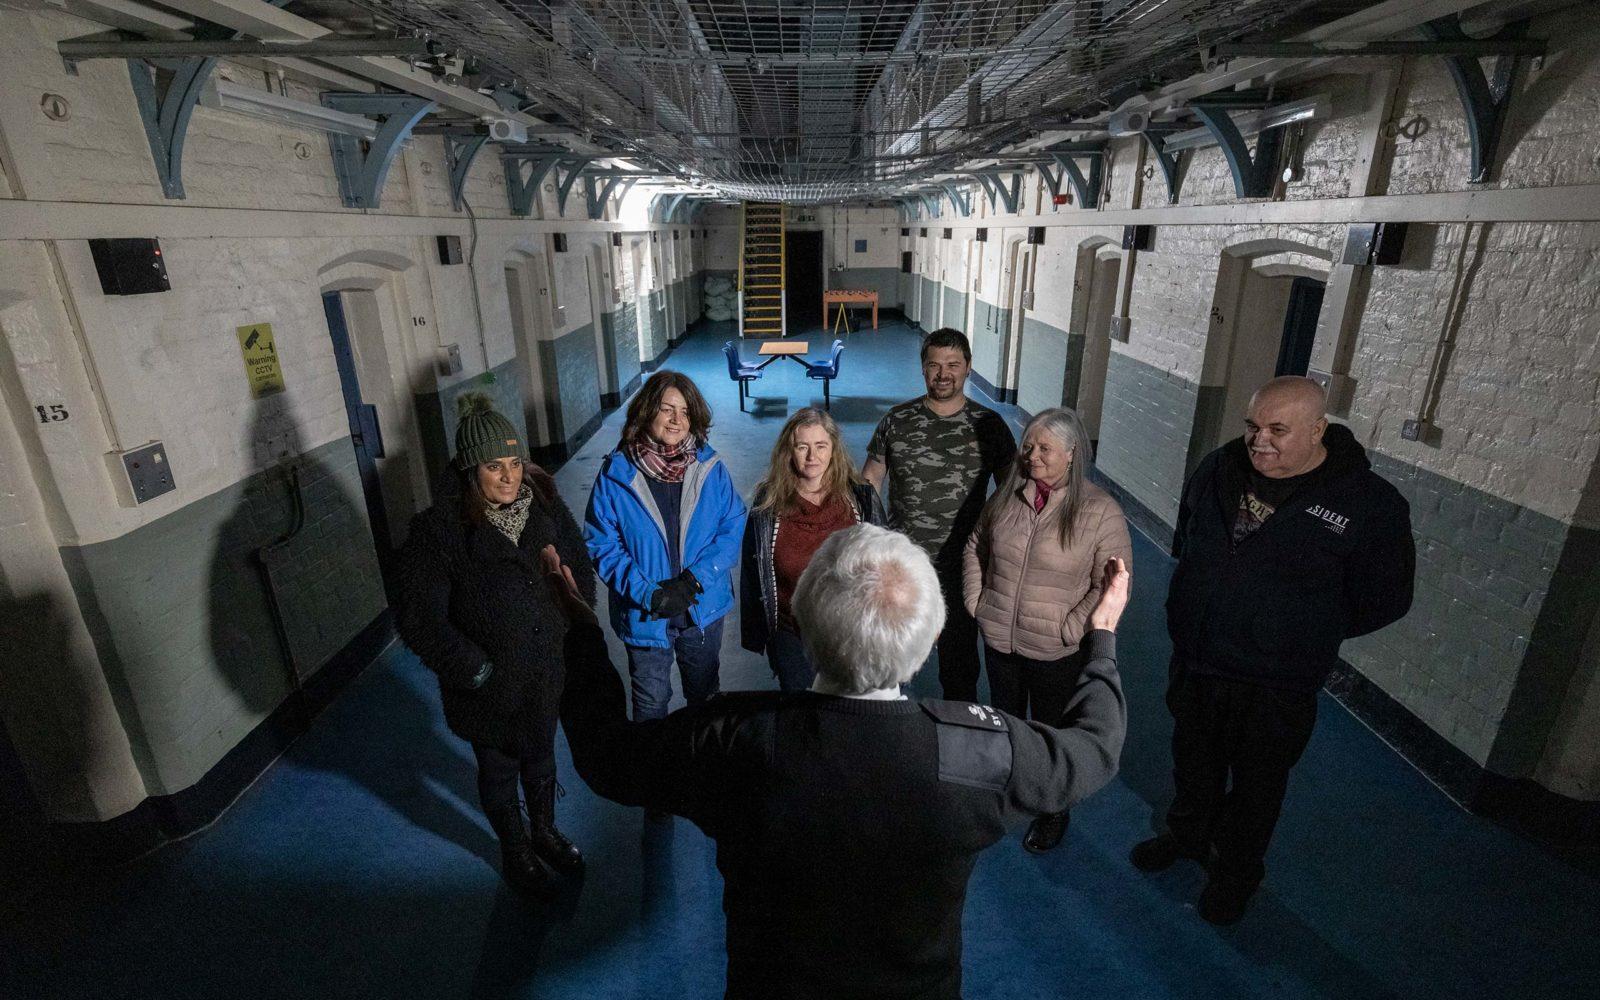 Shrewsbury Prison Night Behind Bars | Shrewsbury Prison Overnight Stays